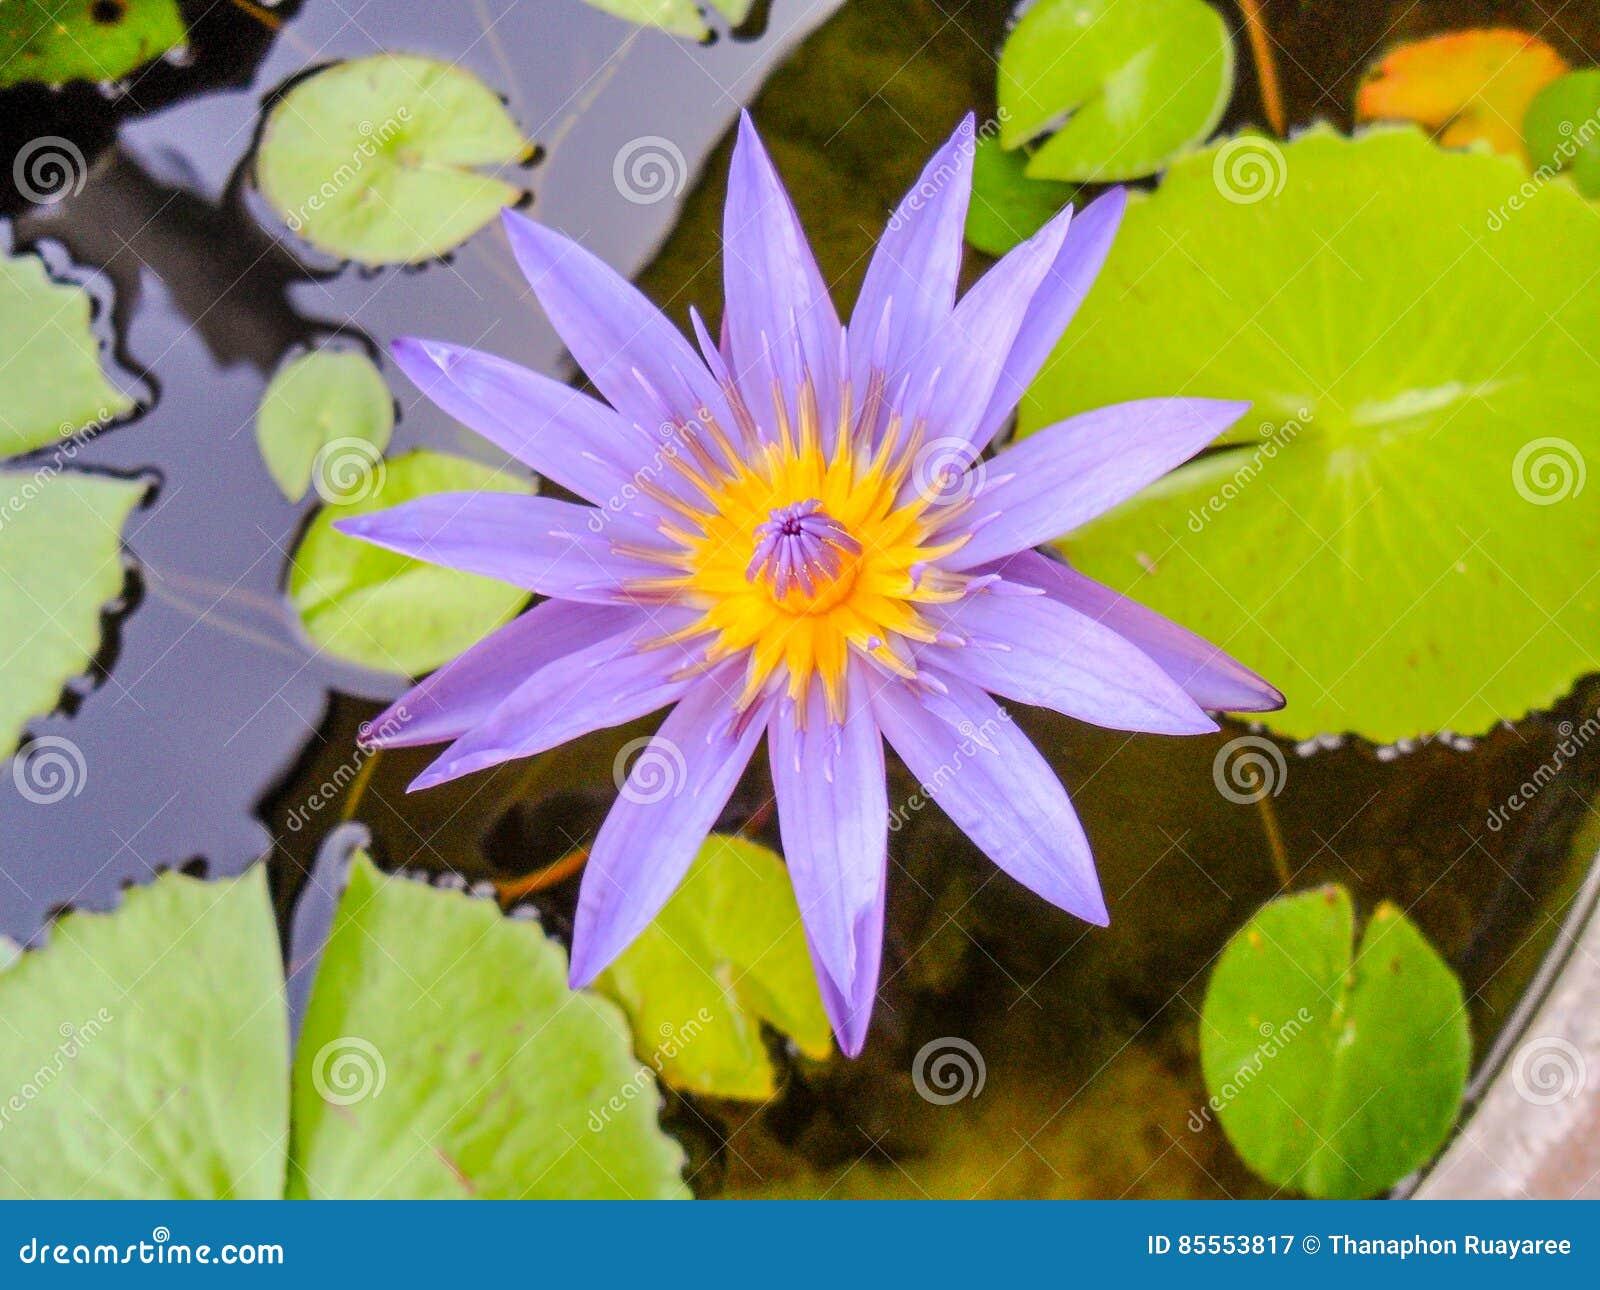 Lotus Flower Buddhism Gallery Flower Wallpaper Hd